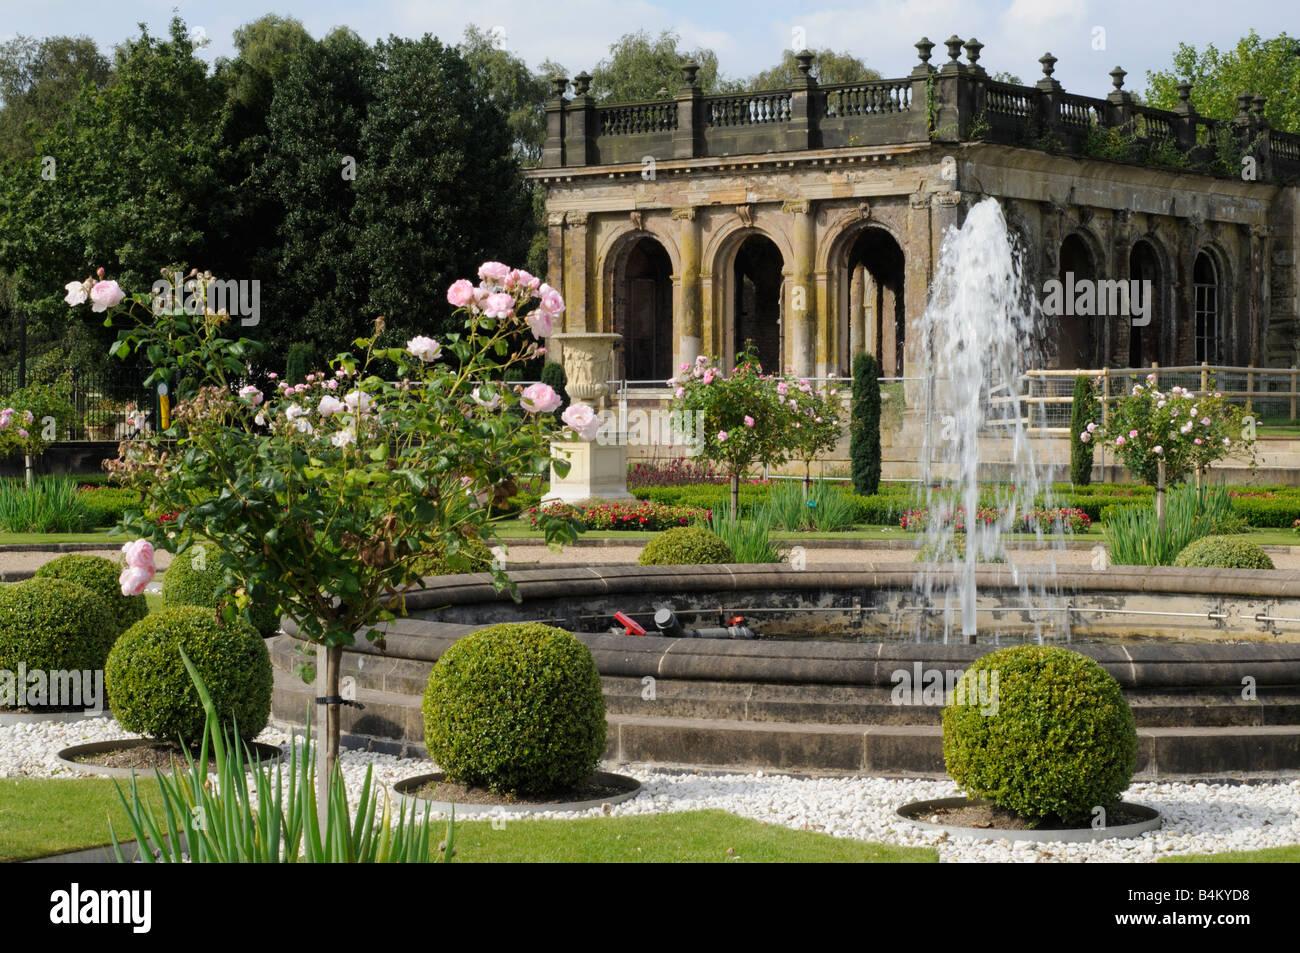 Trentham Gardens - Stock Image